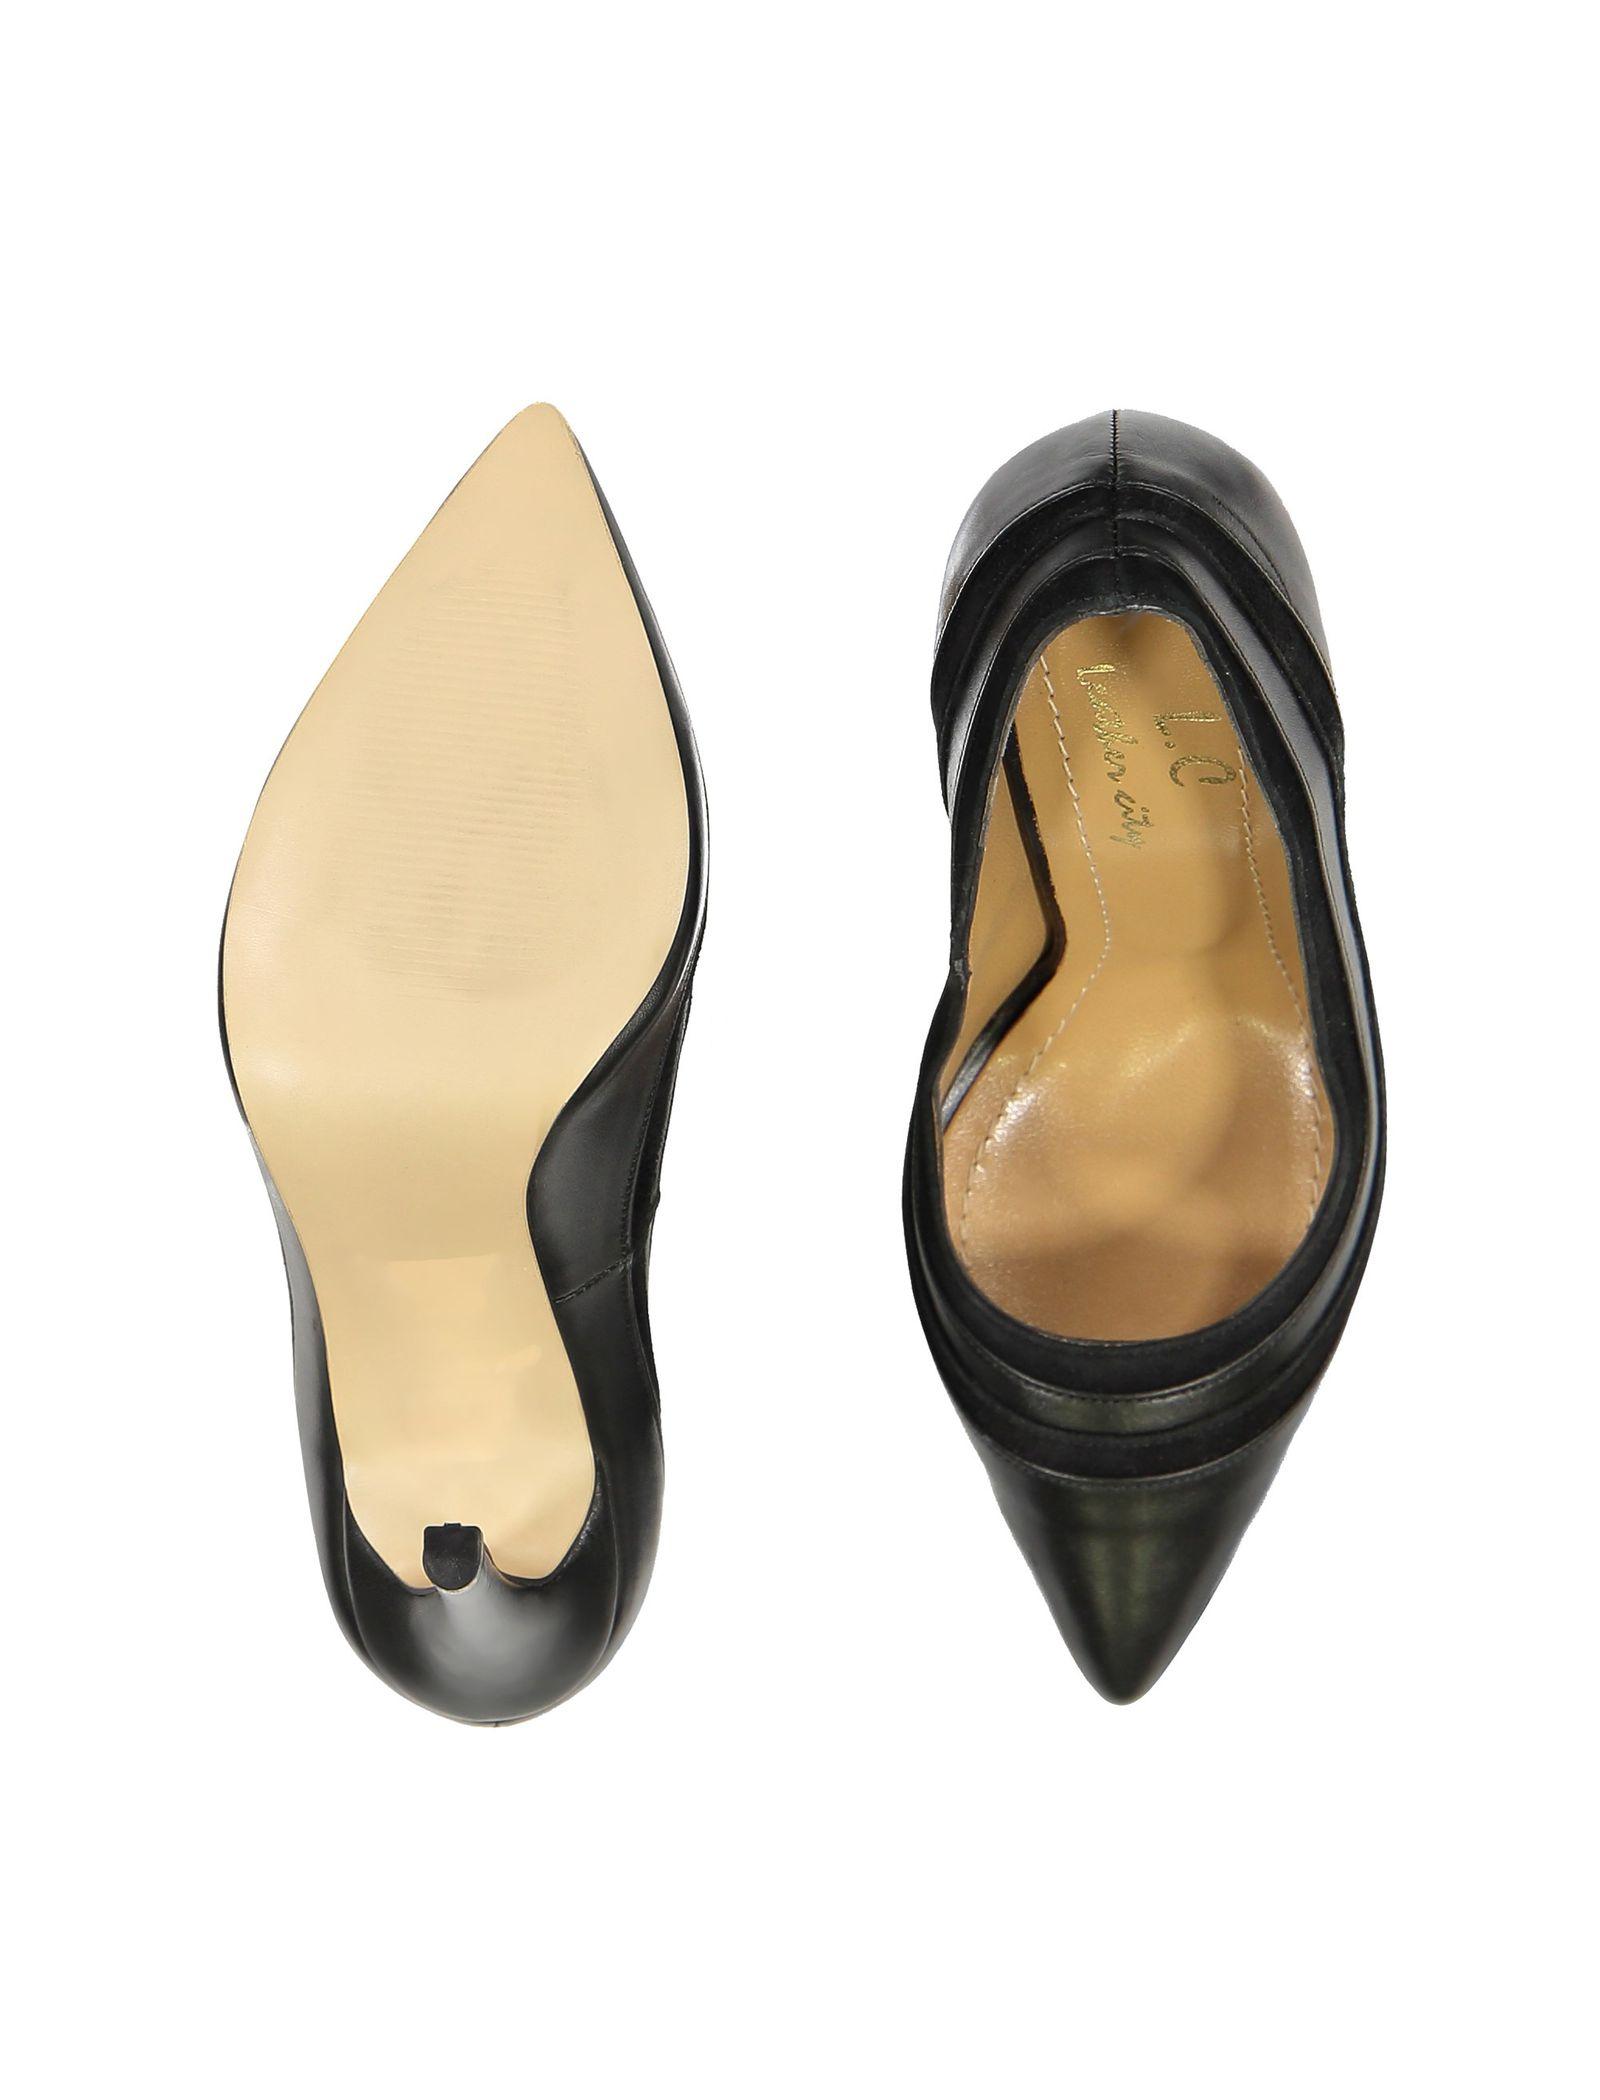 کفش پاشنه بلند چرم زنانه - شهر چرم - مشکي - 2